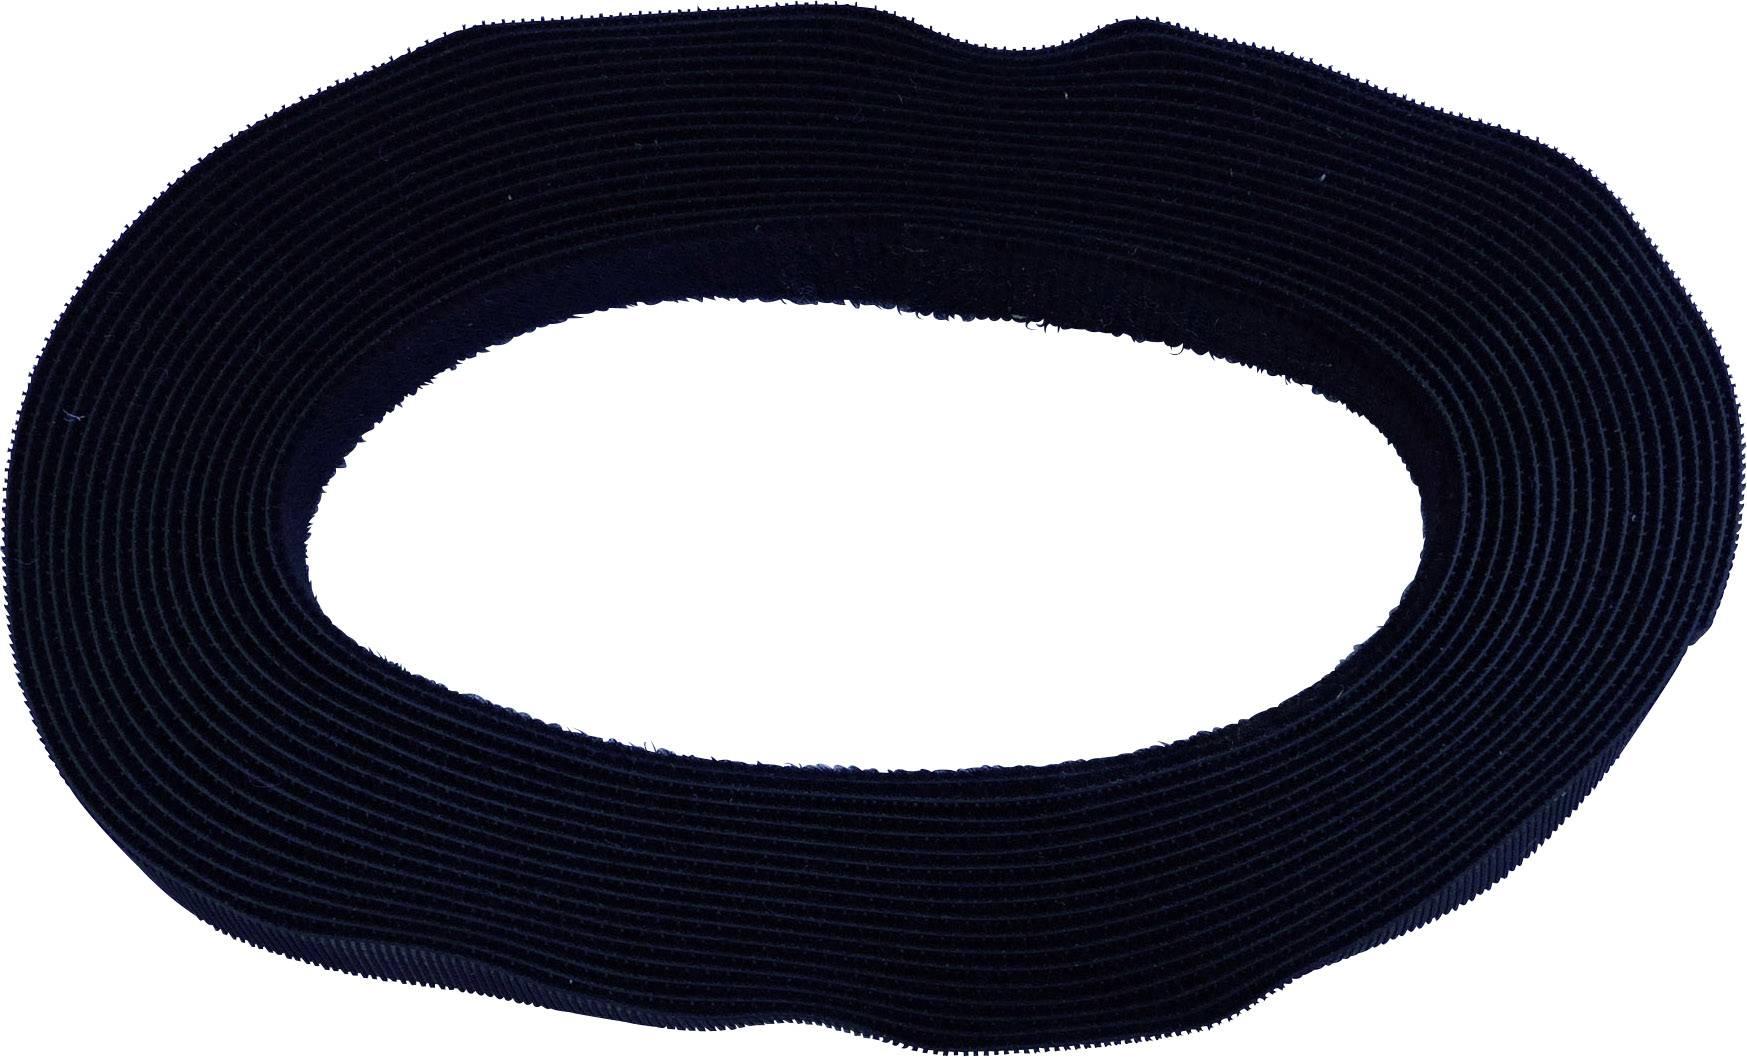 Pásik so suchým zipsom TRU COMPONENTS 697-330-Bag, (d x š) 5000 mm x 20 mm, čierna, 5 m